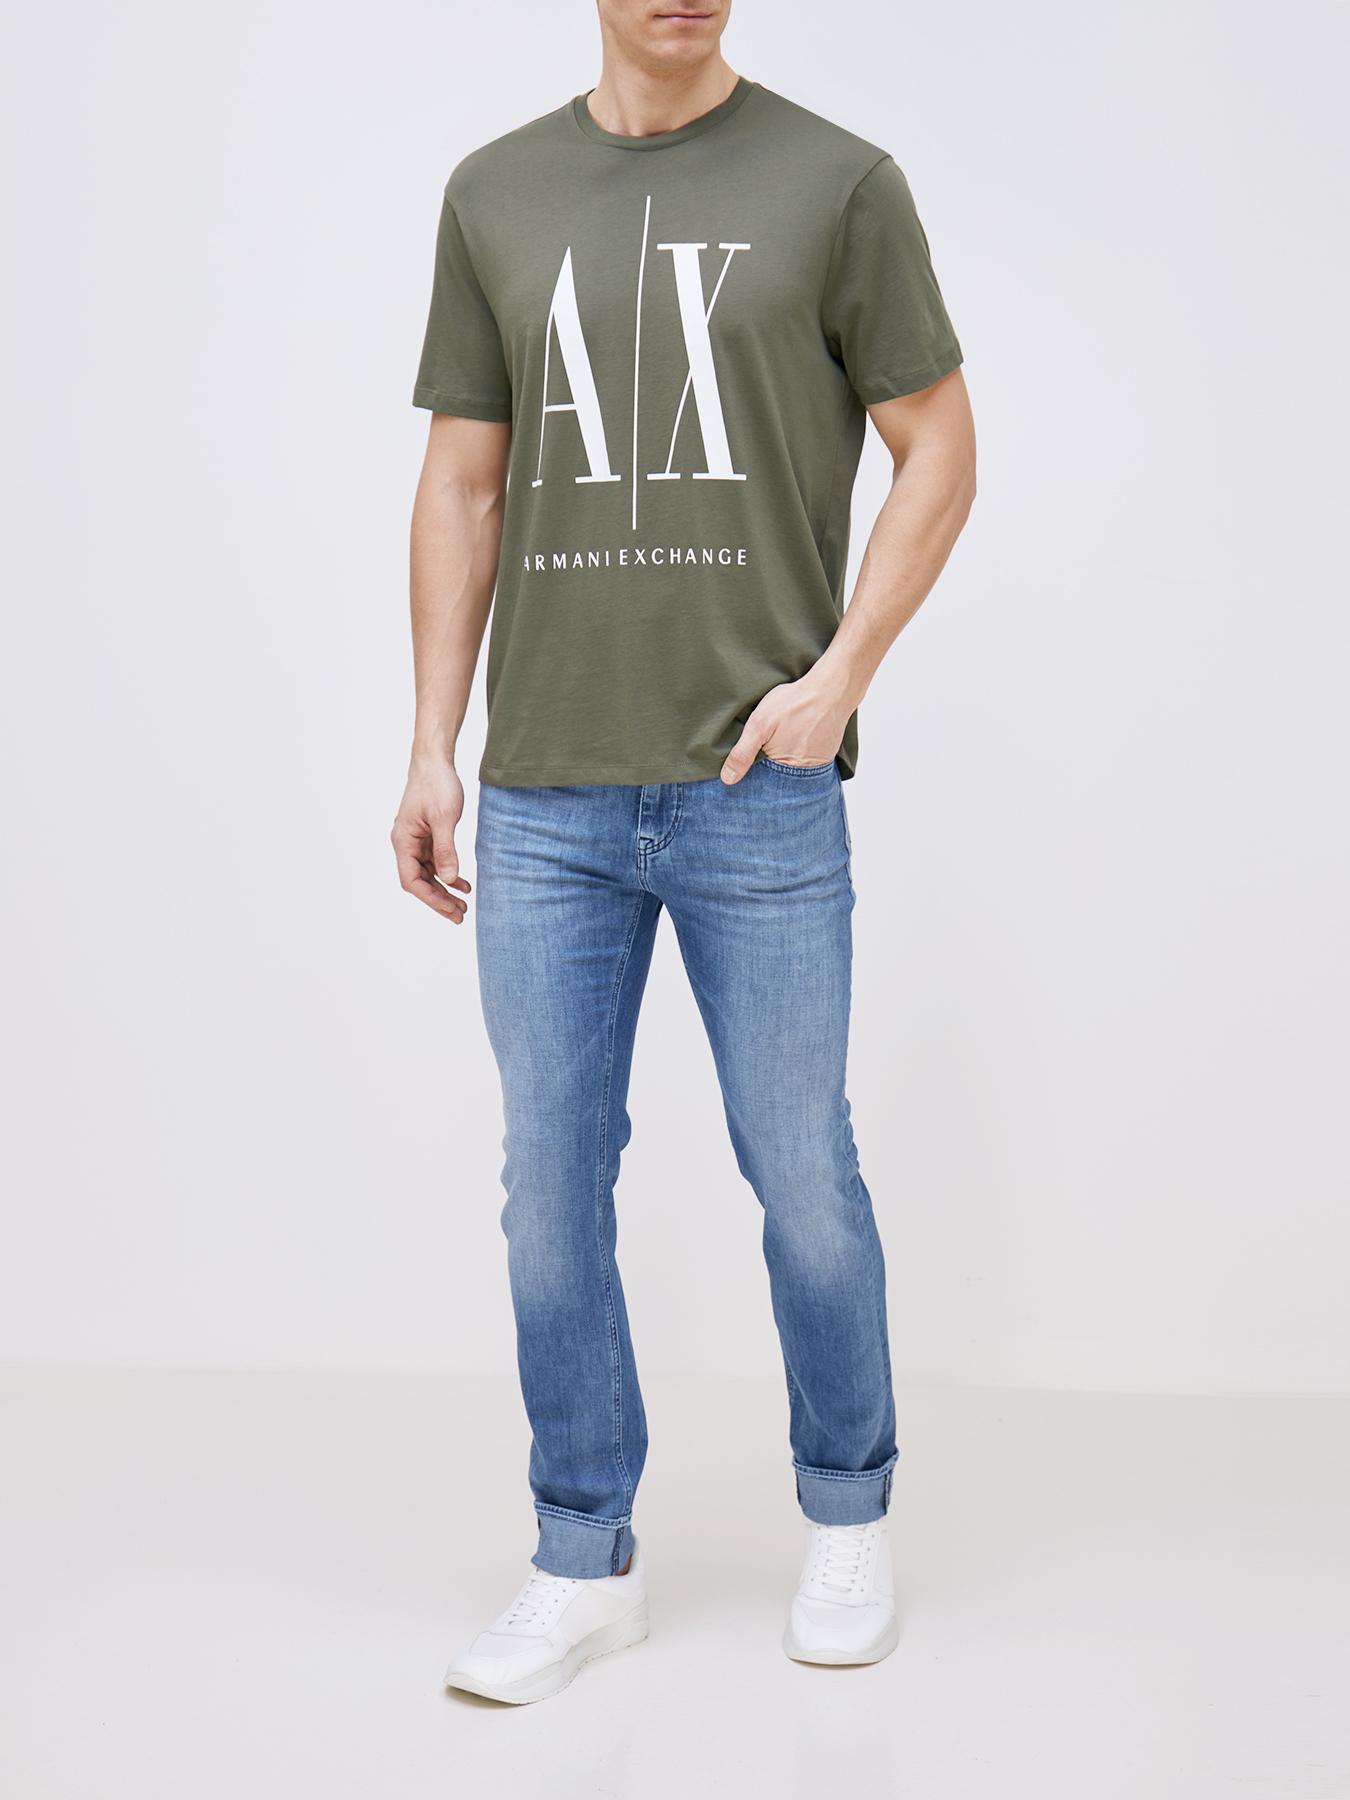 Фуфайка (футболка) Armani Exchange Футболка футболка armani exchange armani exchange ar037emekfi8